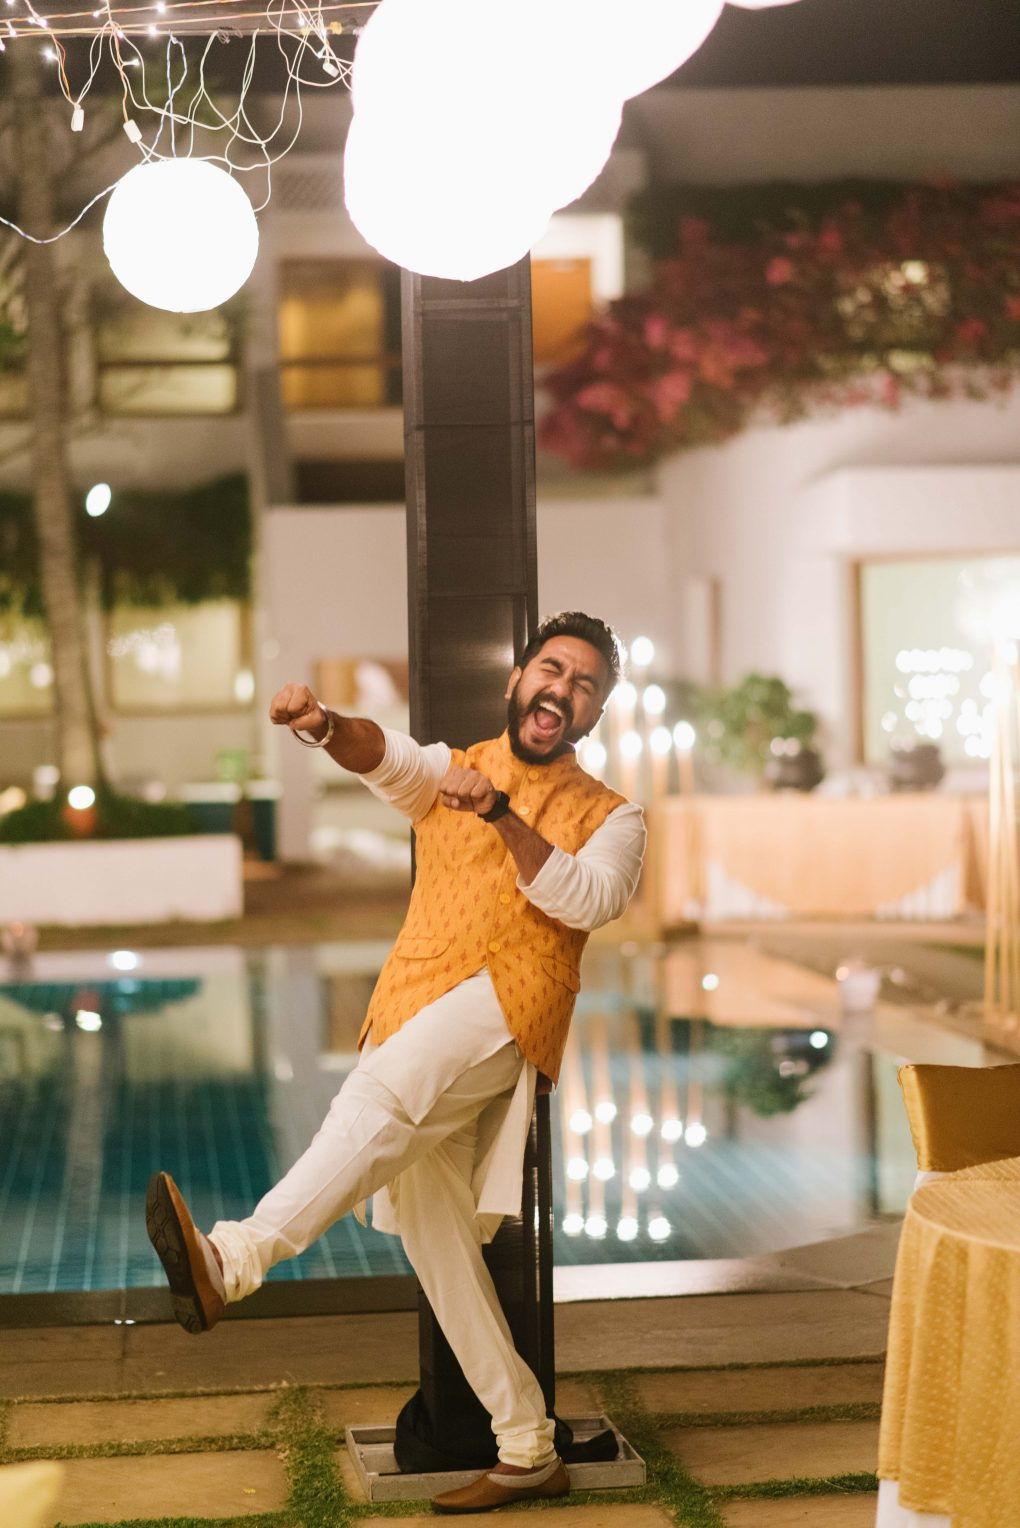 Photographer Manish Singh